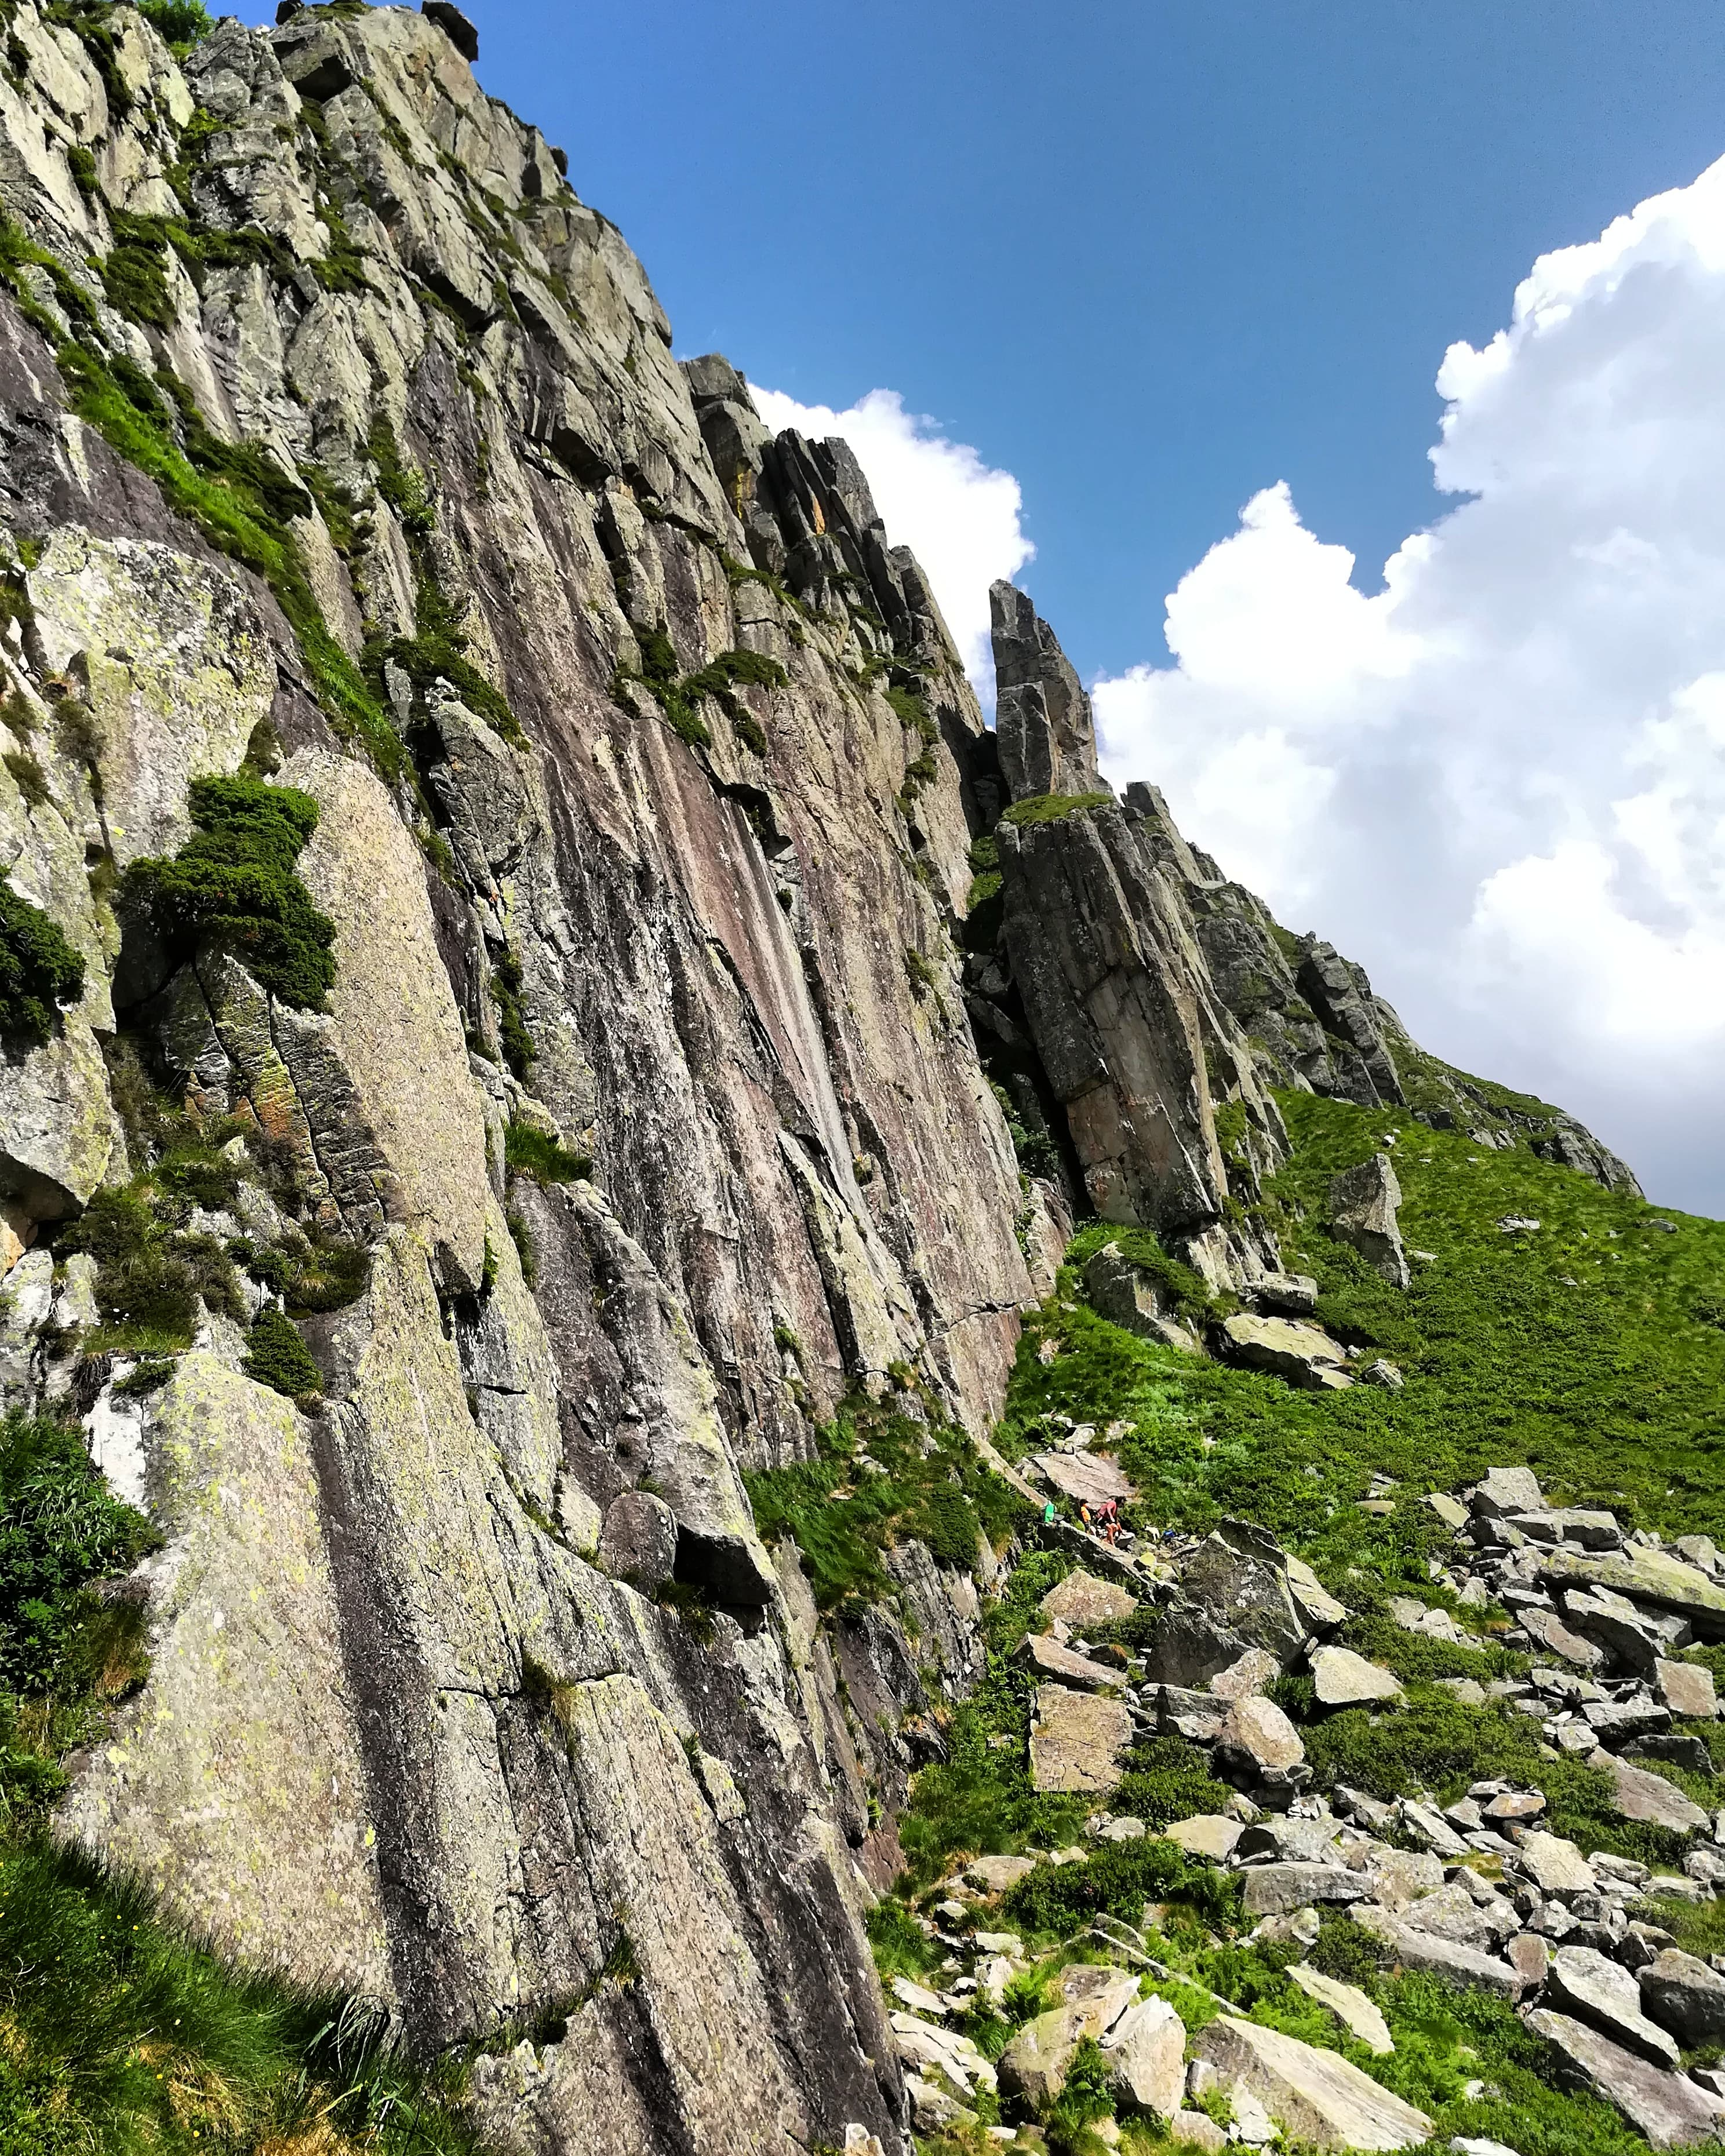 GC - escalade en ariege - turguilla - couserans - Juillet 2018 (1)